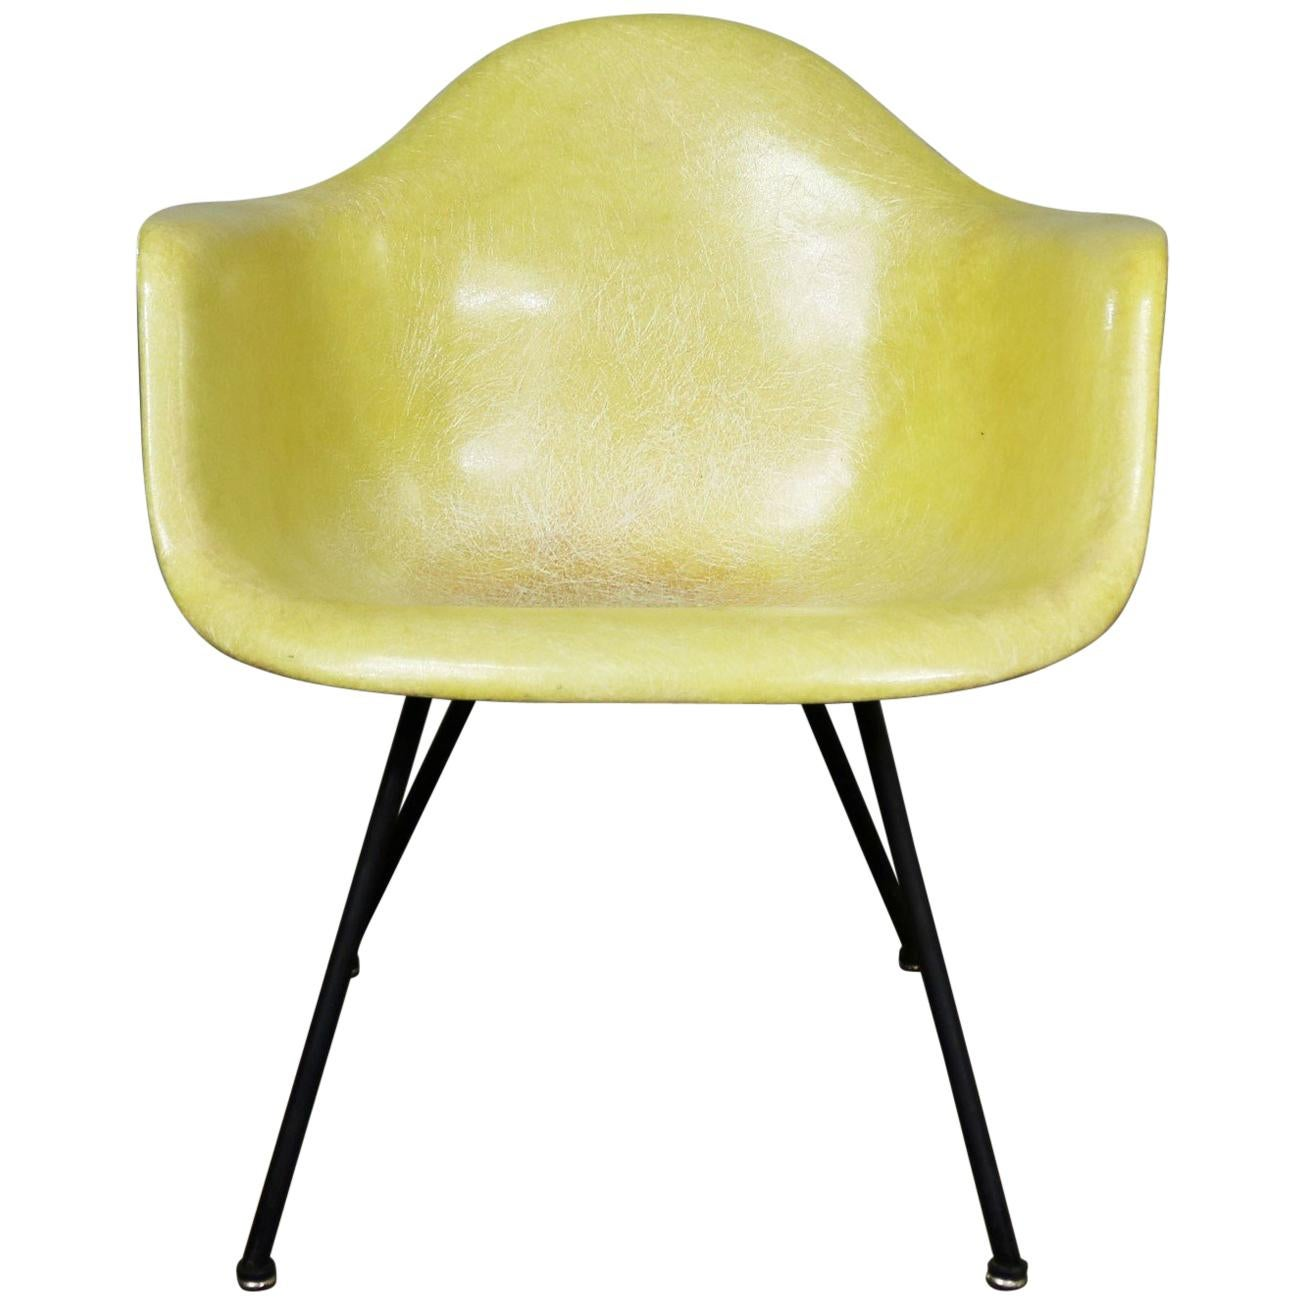 Eames Herman Miller LAX Fiberglass Arm Shell Chair X Base Zenith Rope Edge